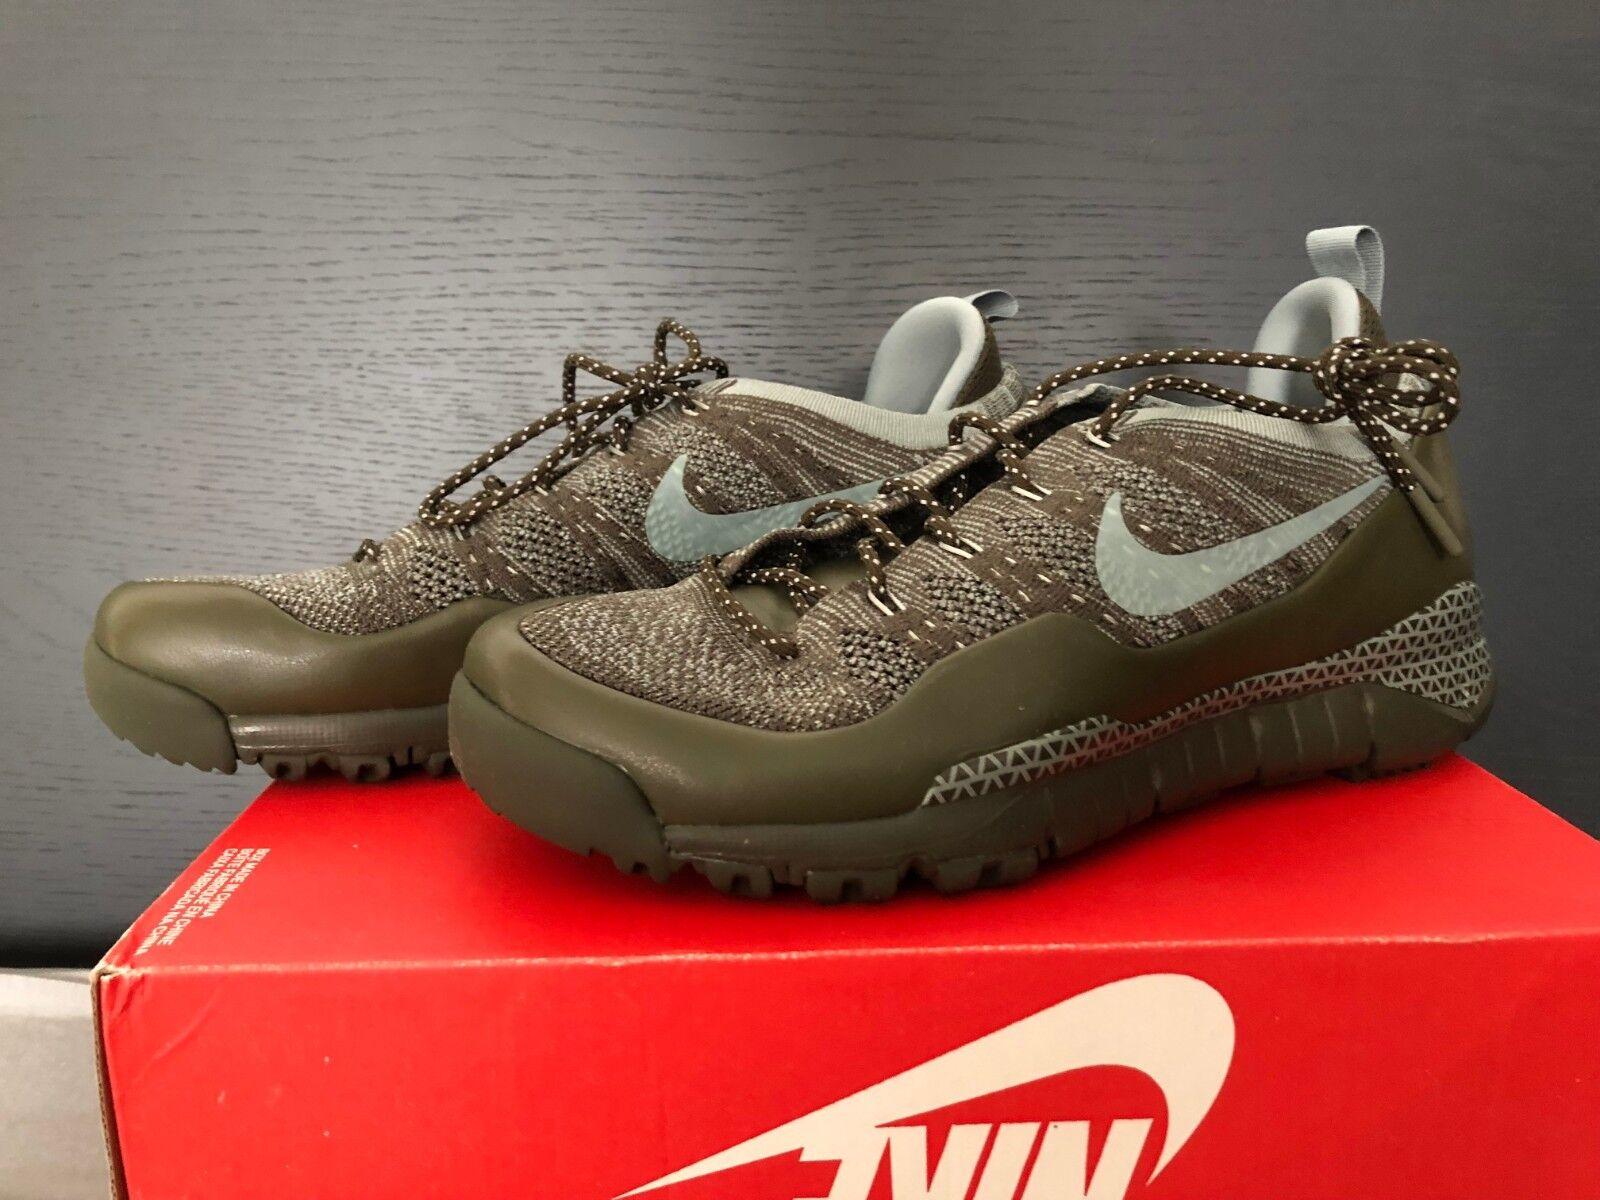 d239dd2a702971 Nike Nike Nike LUPINEK FLYKNIT LOW - grün - khaki - 882685-300 - EU 44 US  10 - NEU 935895